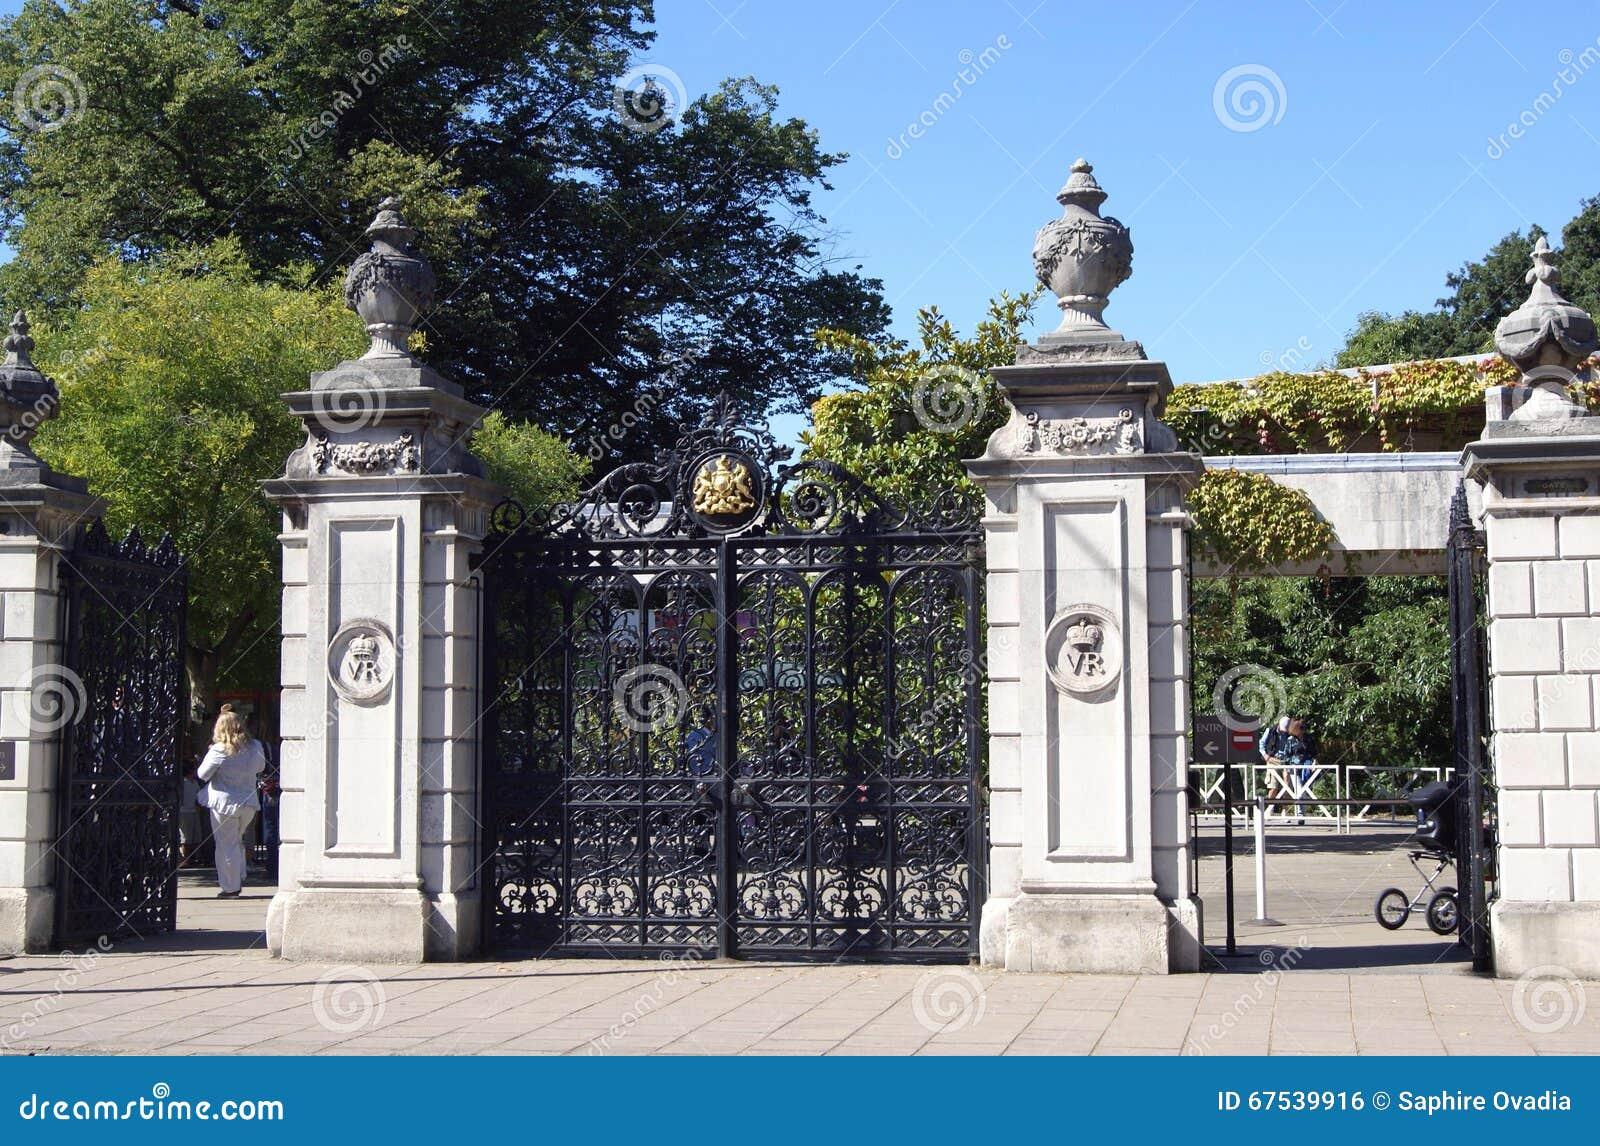 ornate wrought iron gate. editorial stock photo download ornate wrought iron gate